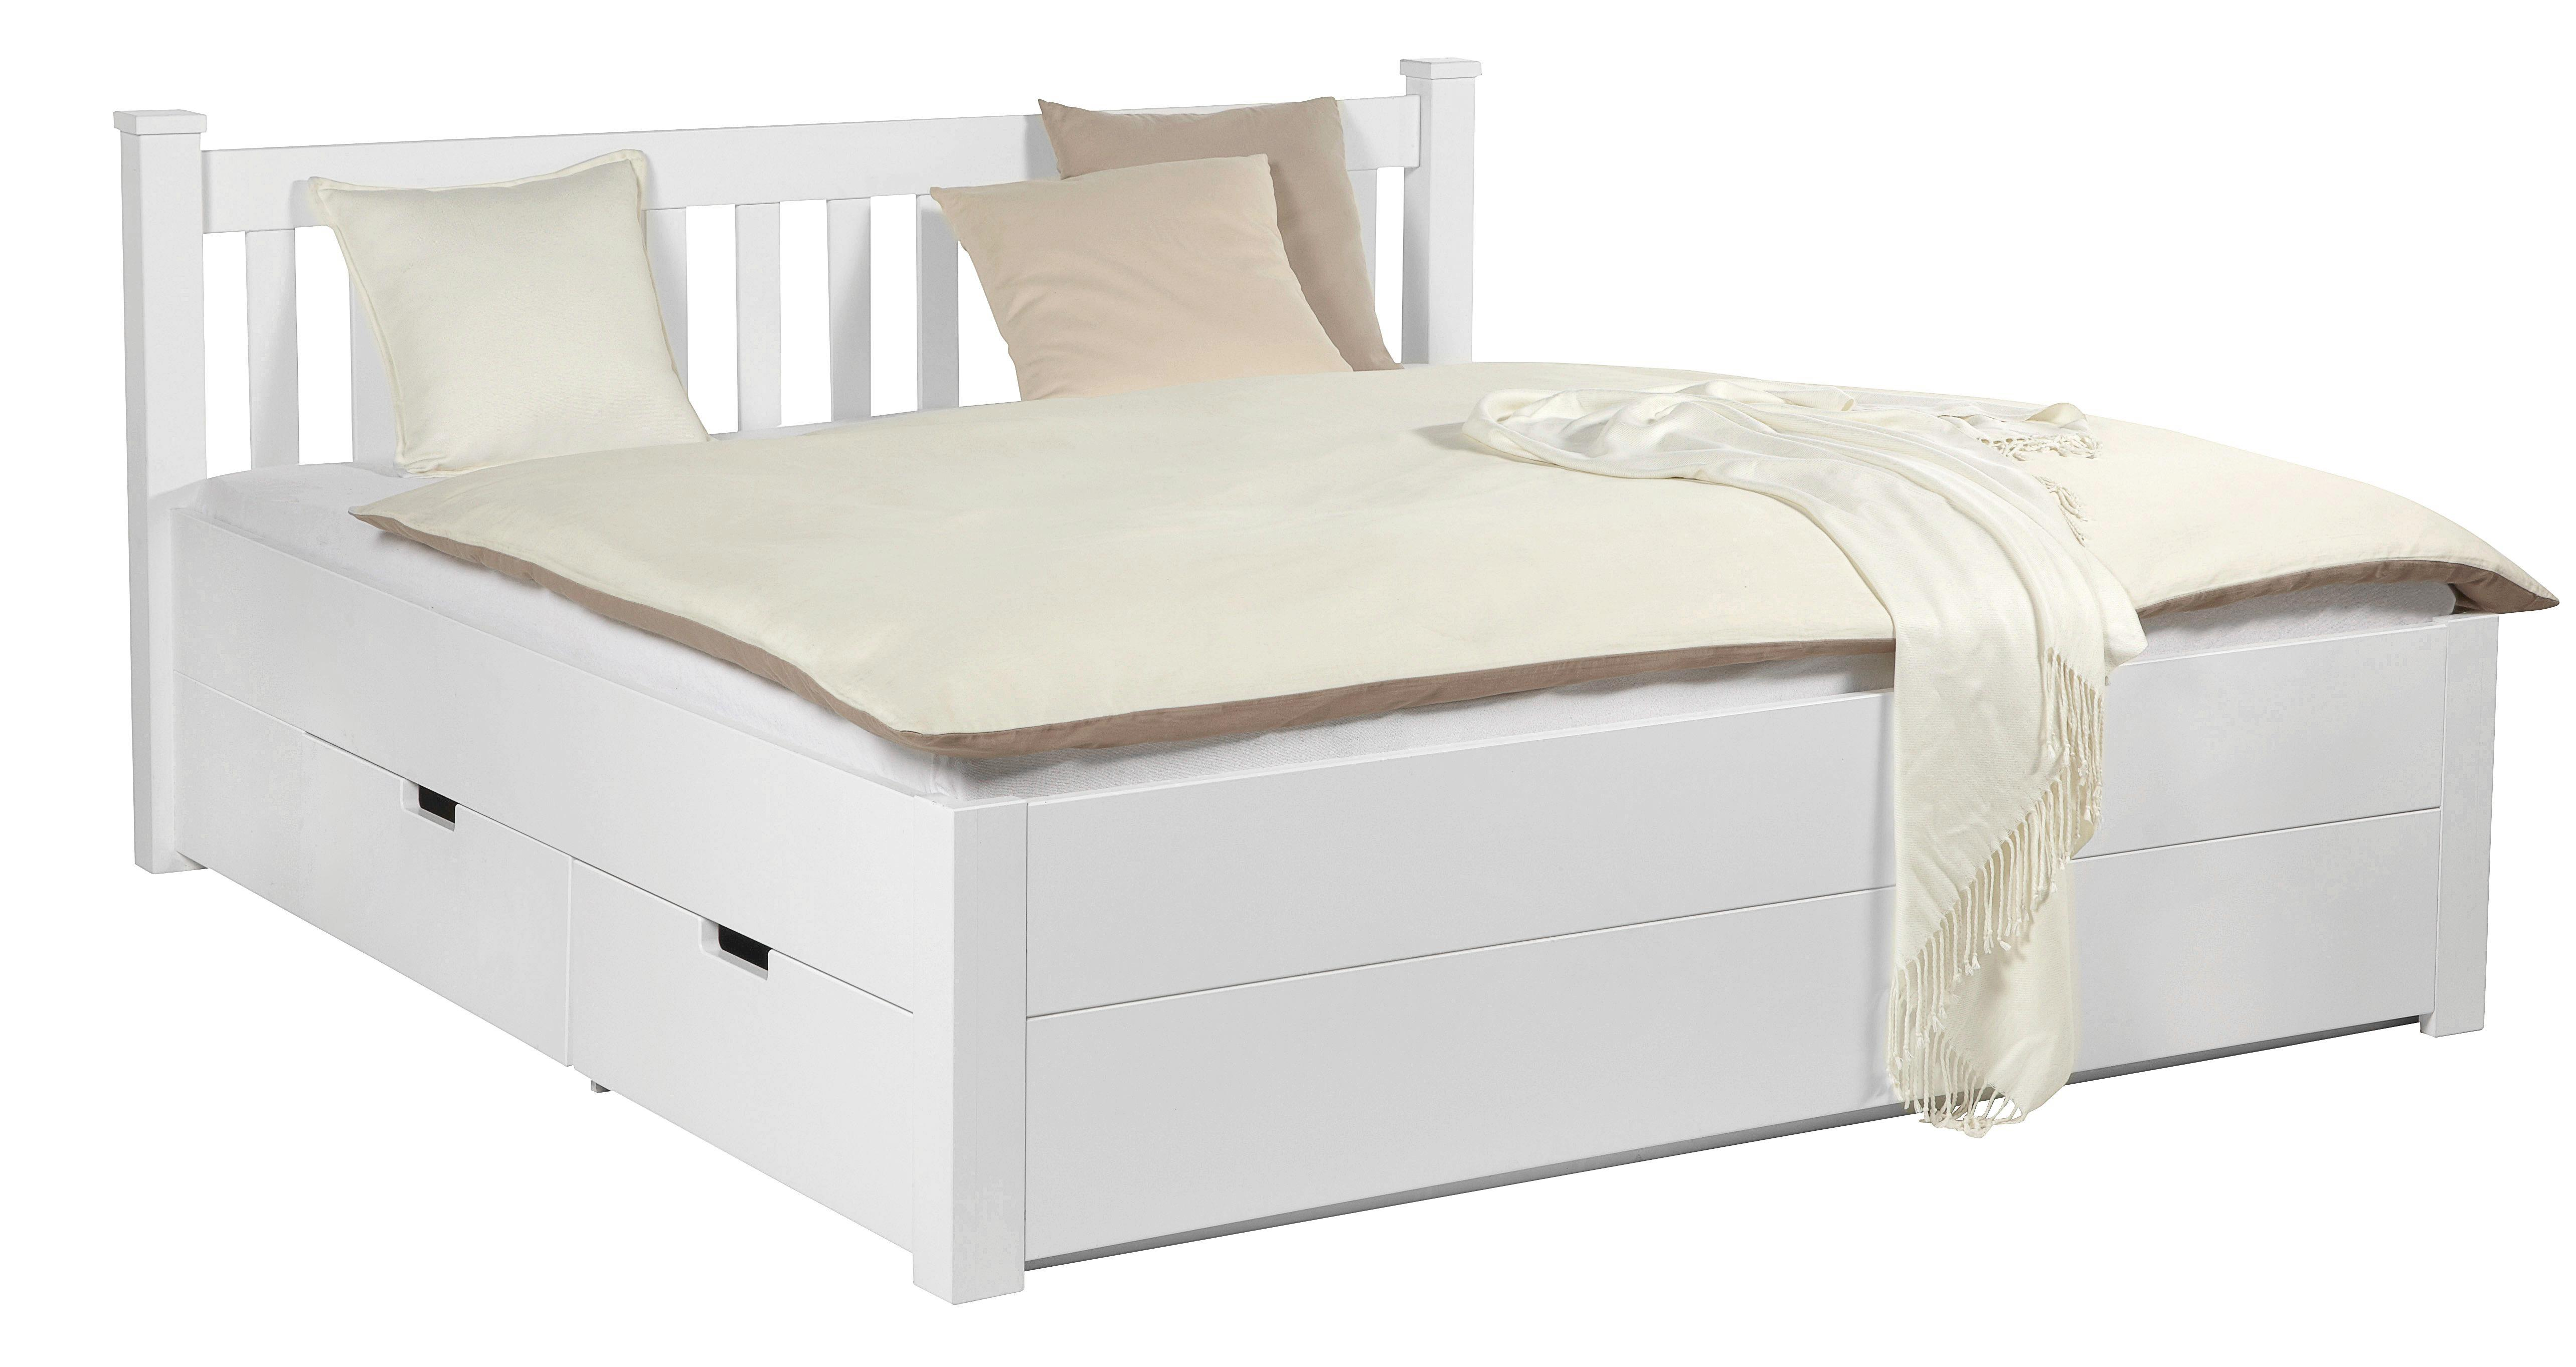 weies doppelbett cheap sparset kylian wei tlg with weies doppelbett bettanlage bett doppelbett. Black Bedroom Furniture Sets. Home Design Ideas